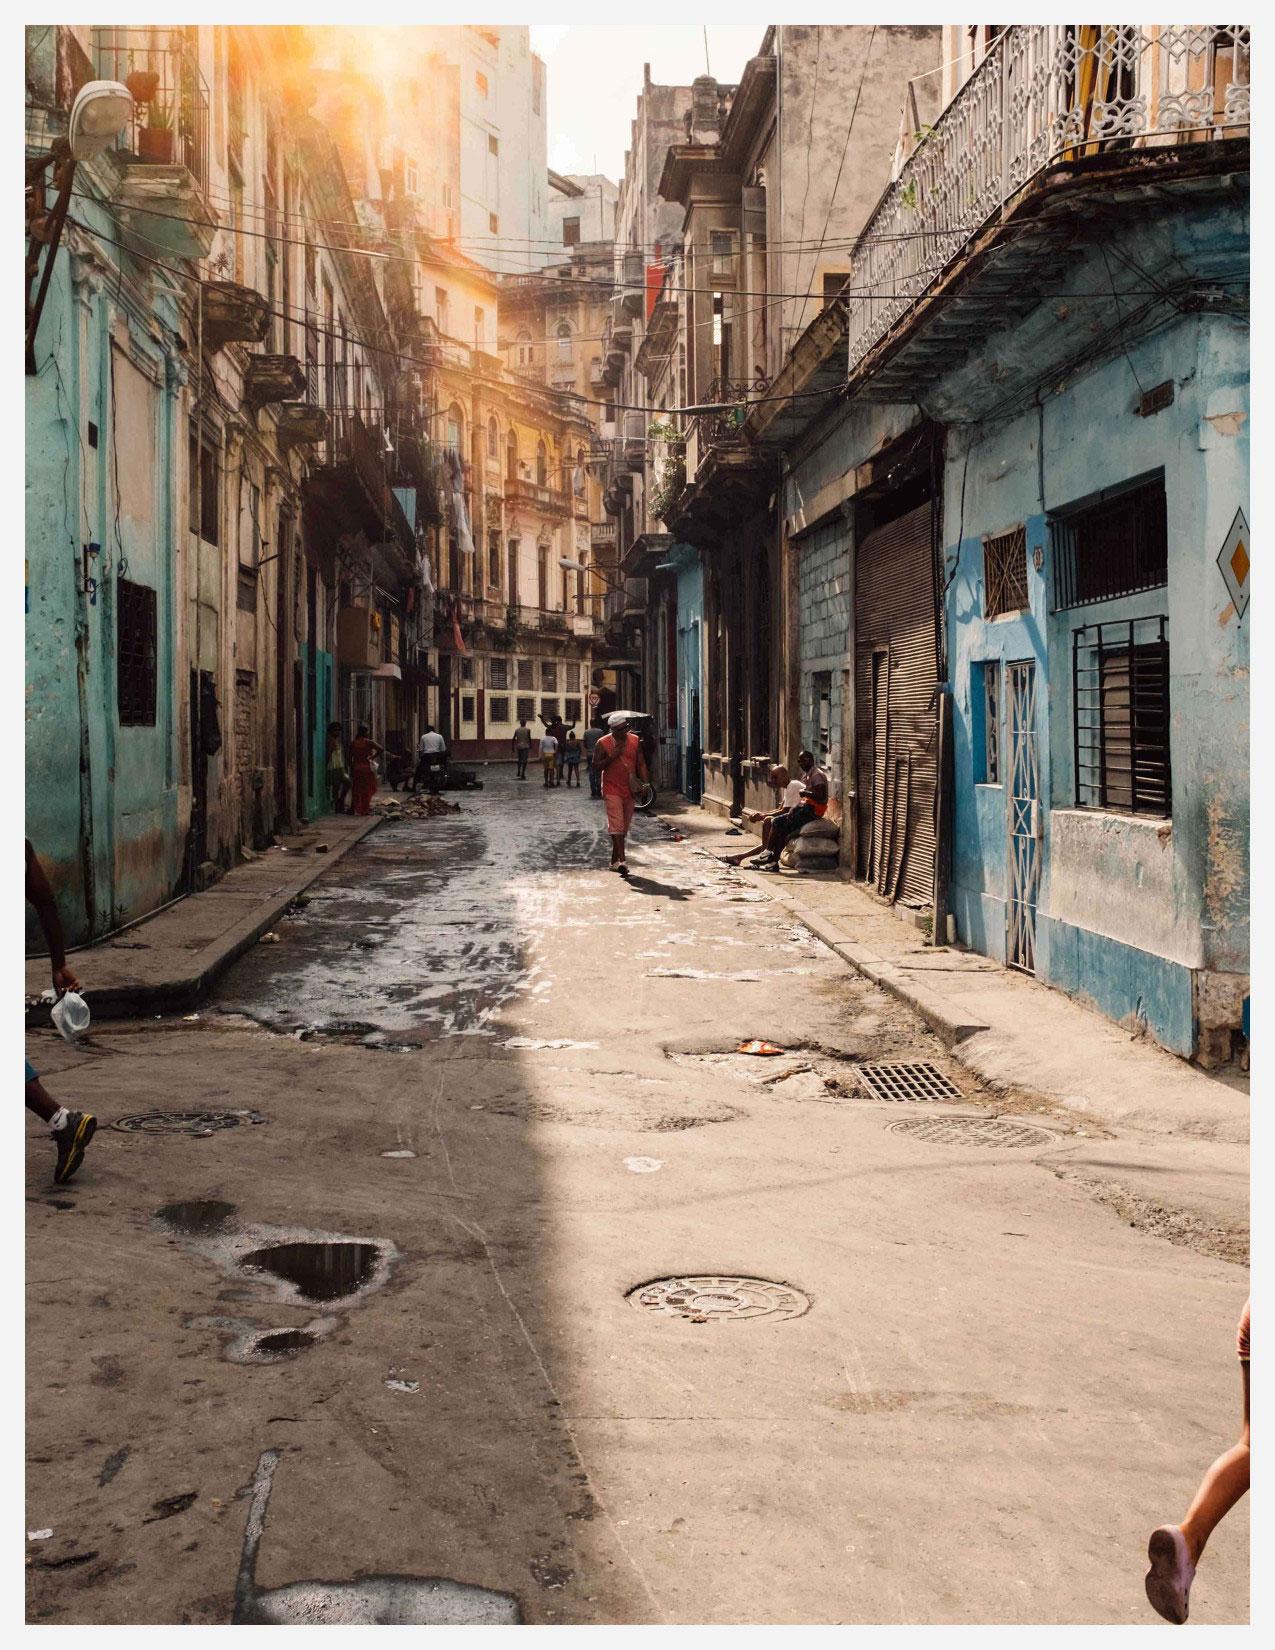 Cuba Travel Network